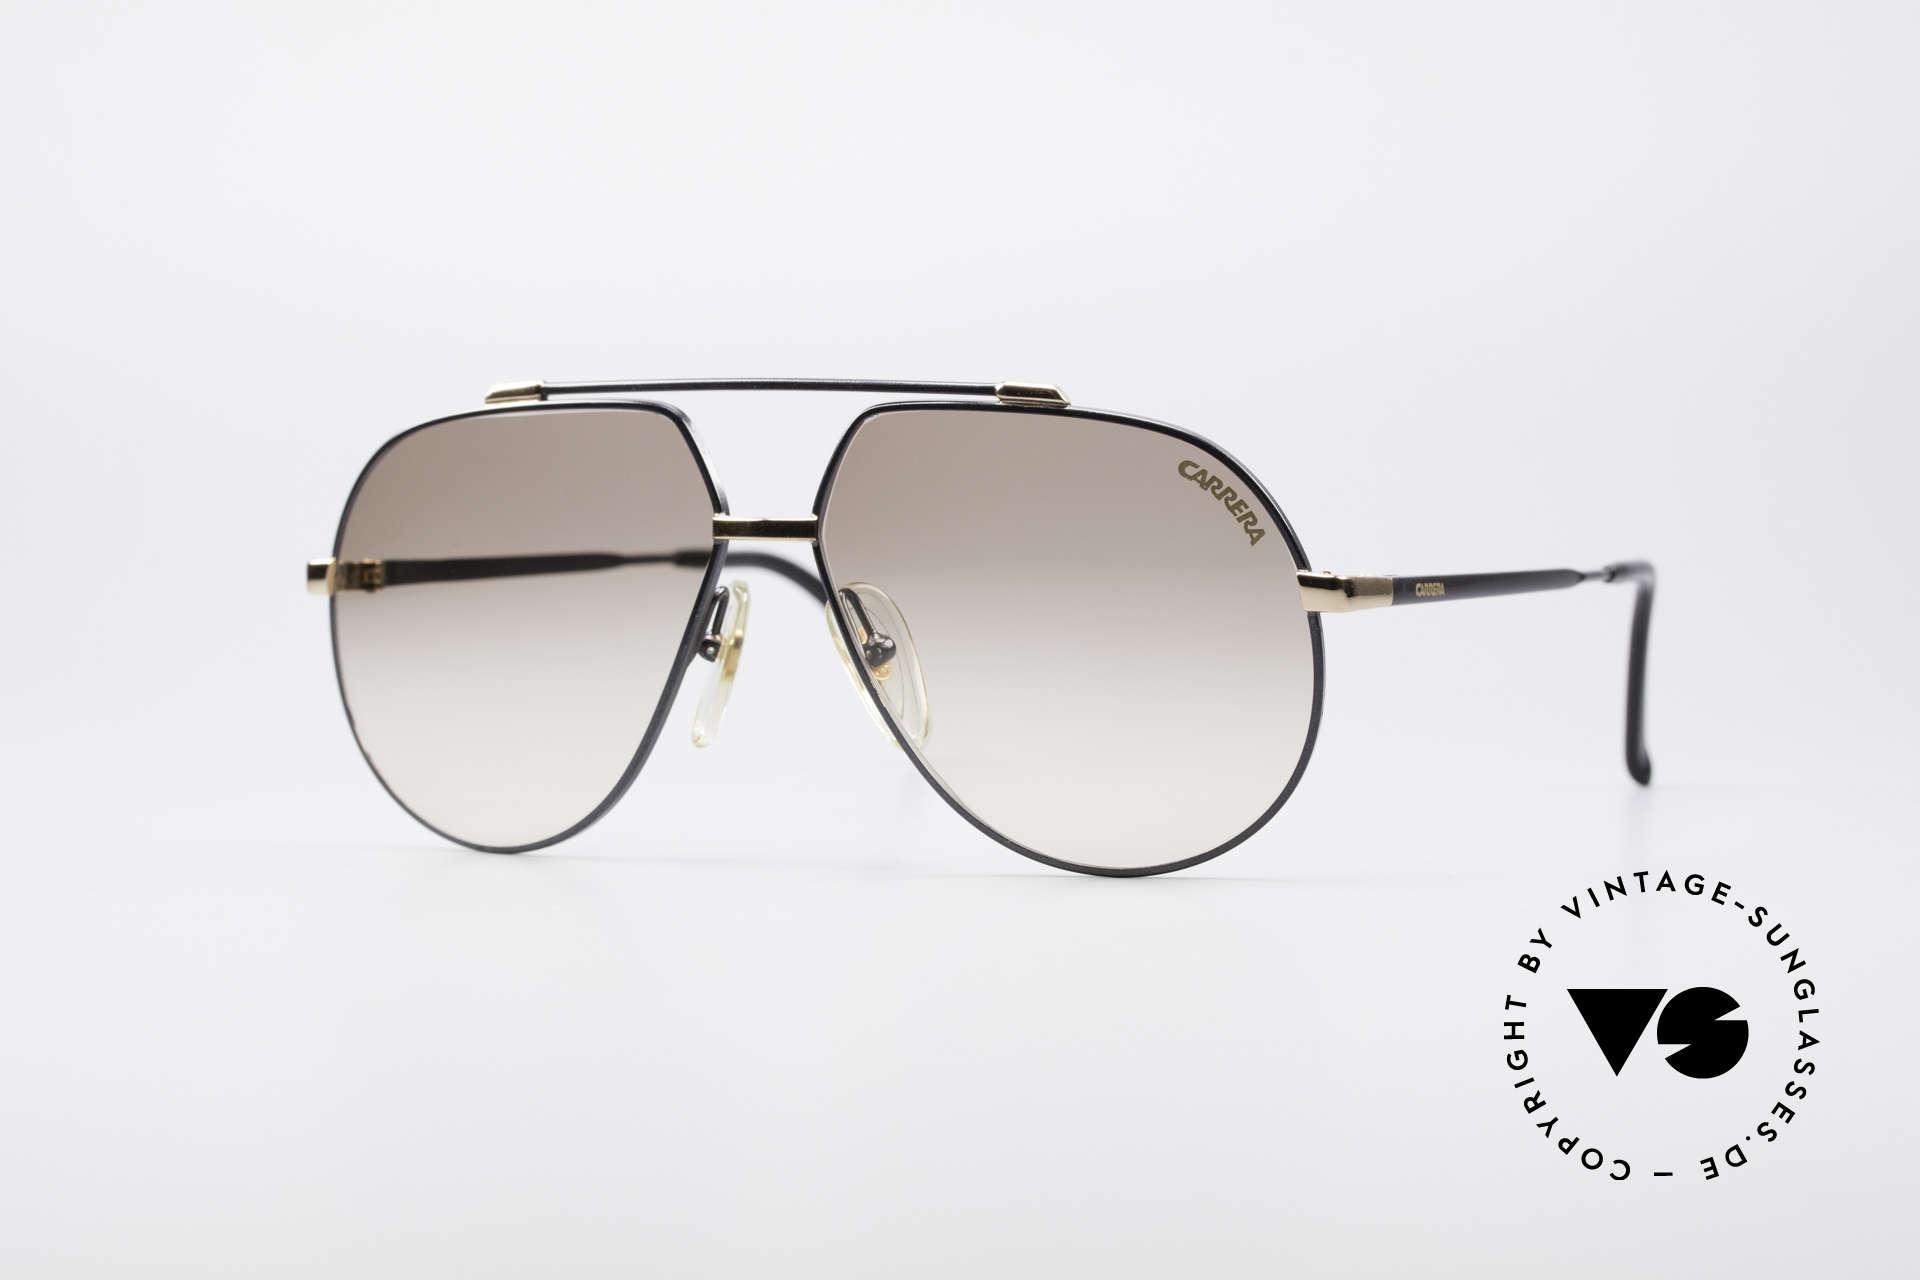 Carrera 5369 90's Men's Sunglasses, vintage sunglasses by CARRERA with double bridge, Made for Men